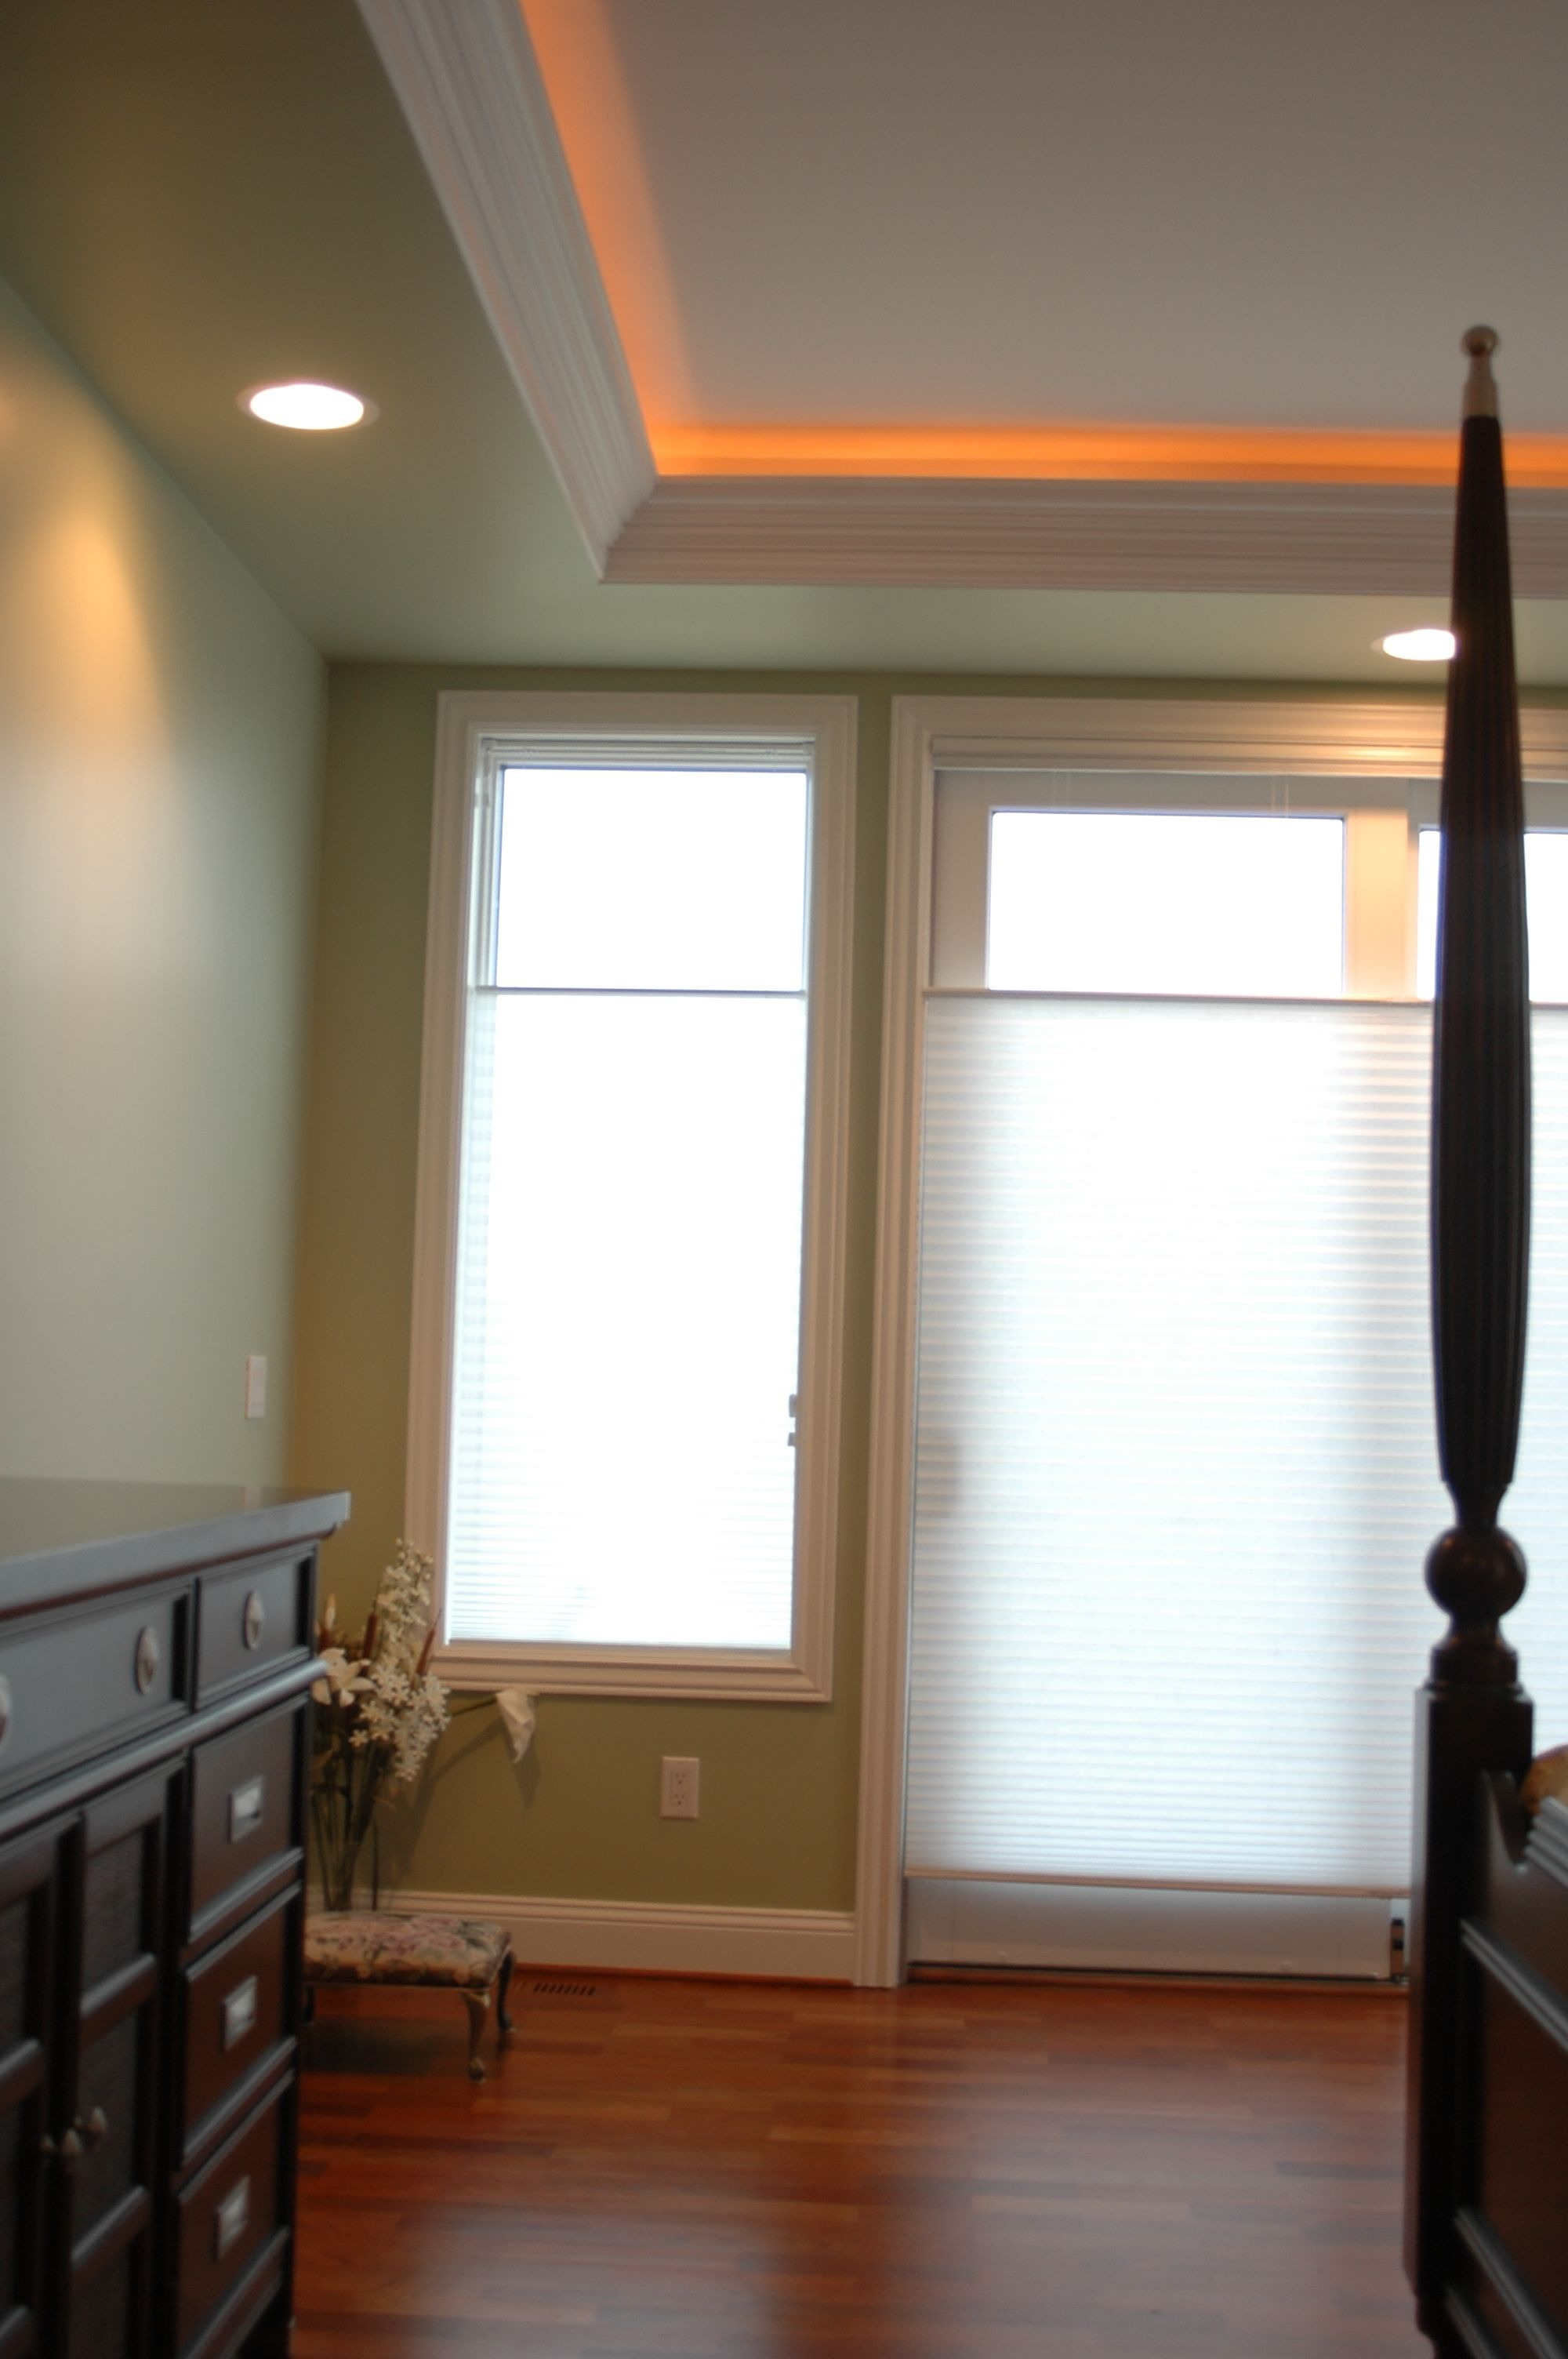 Tray Ceiling With Mood Lighting Living Room Spotlights